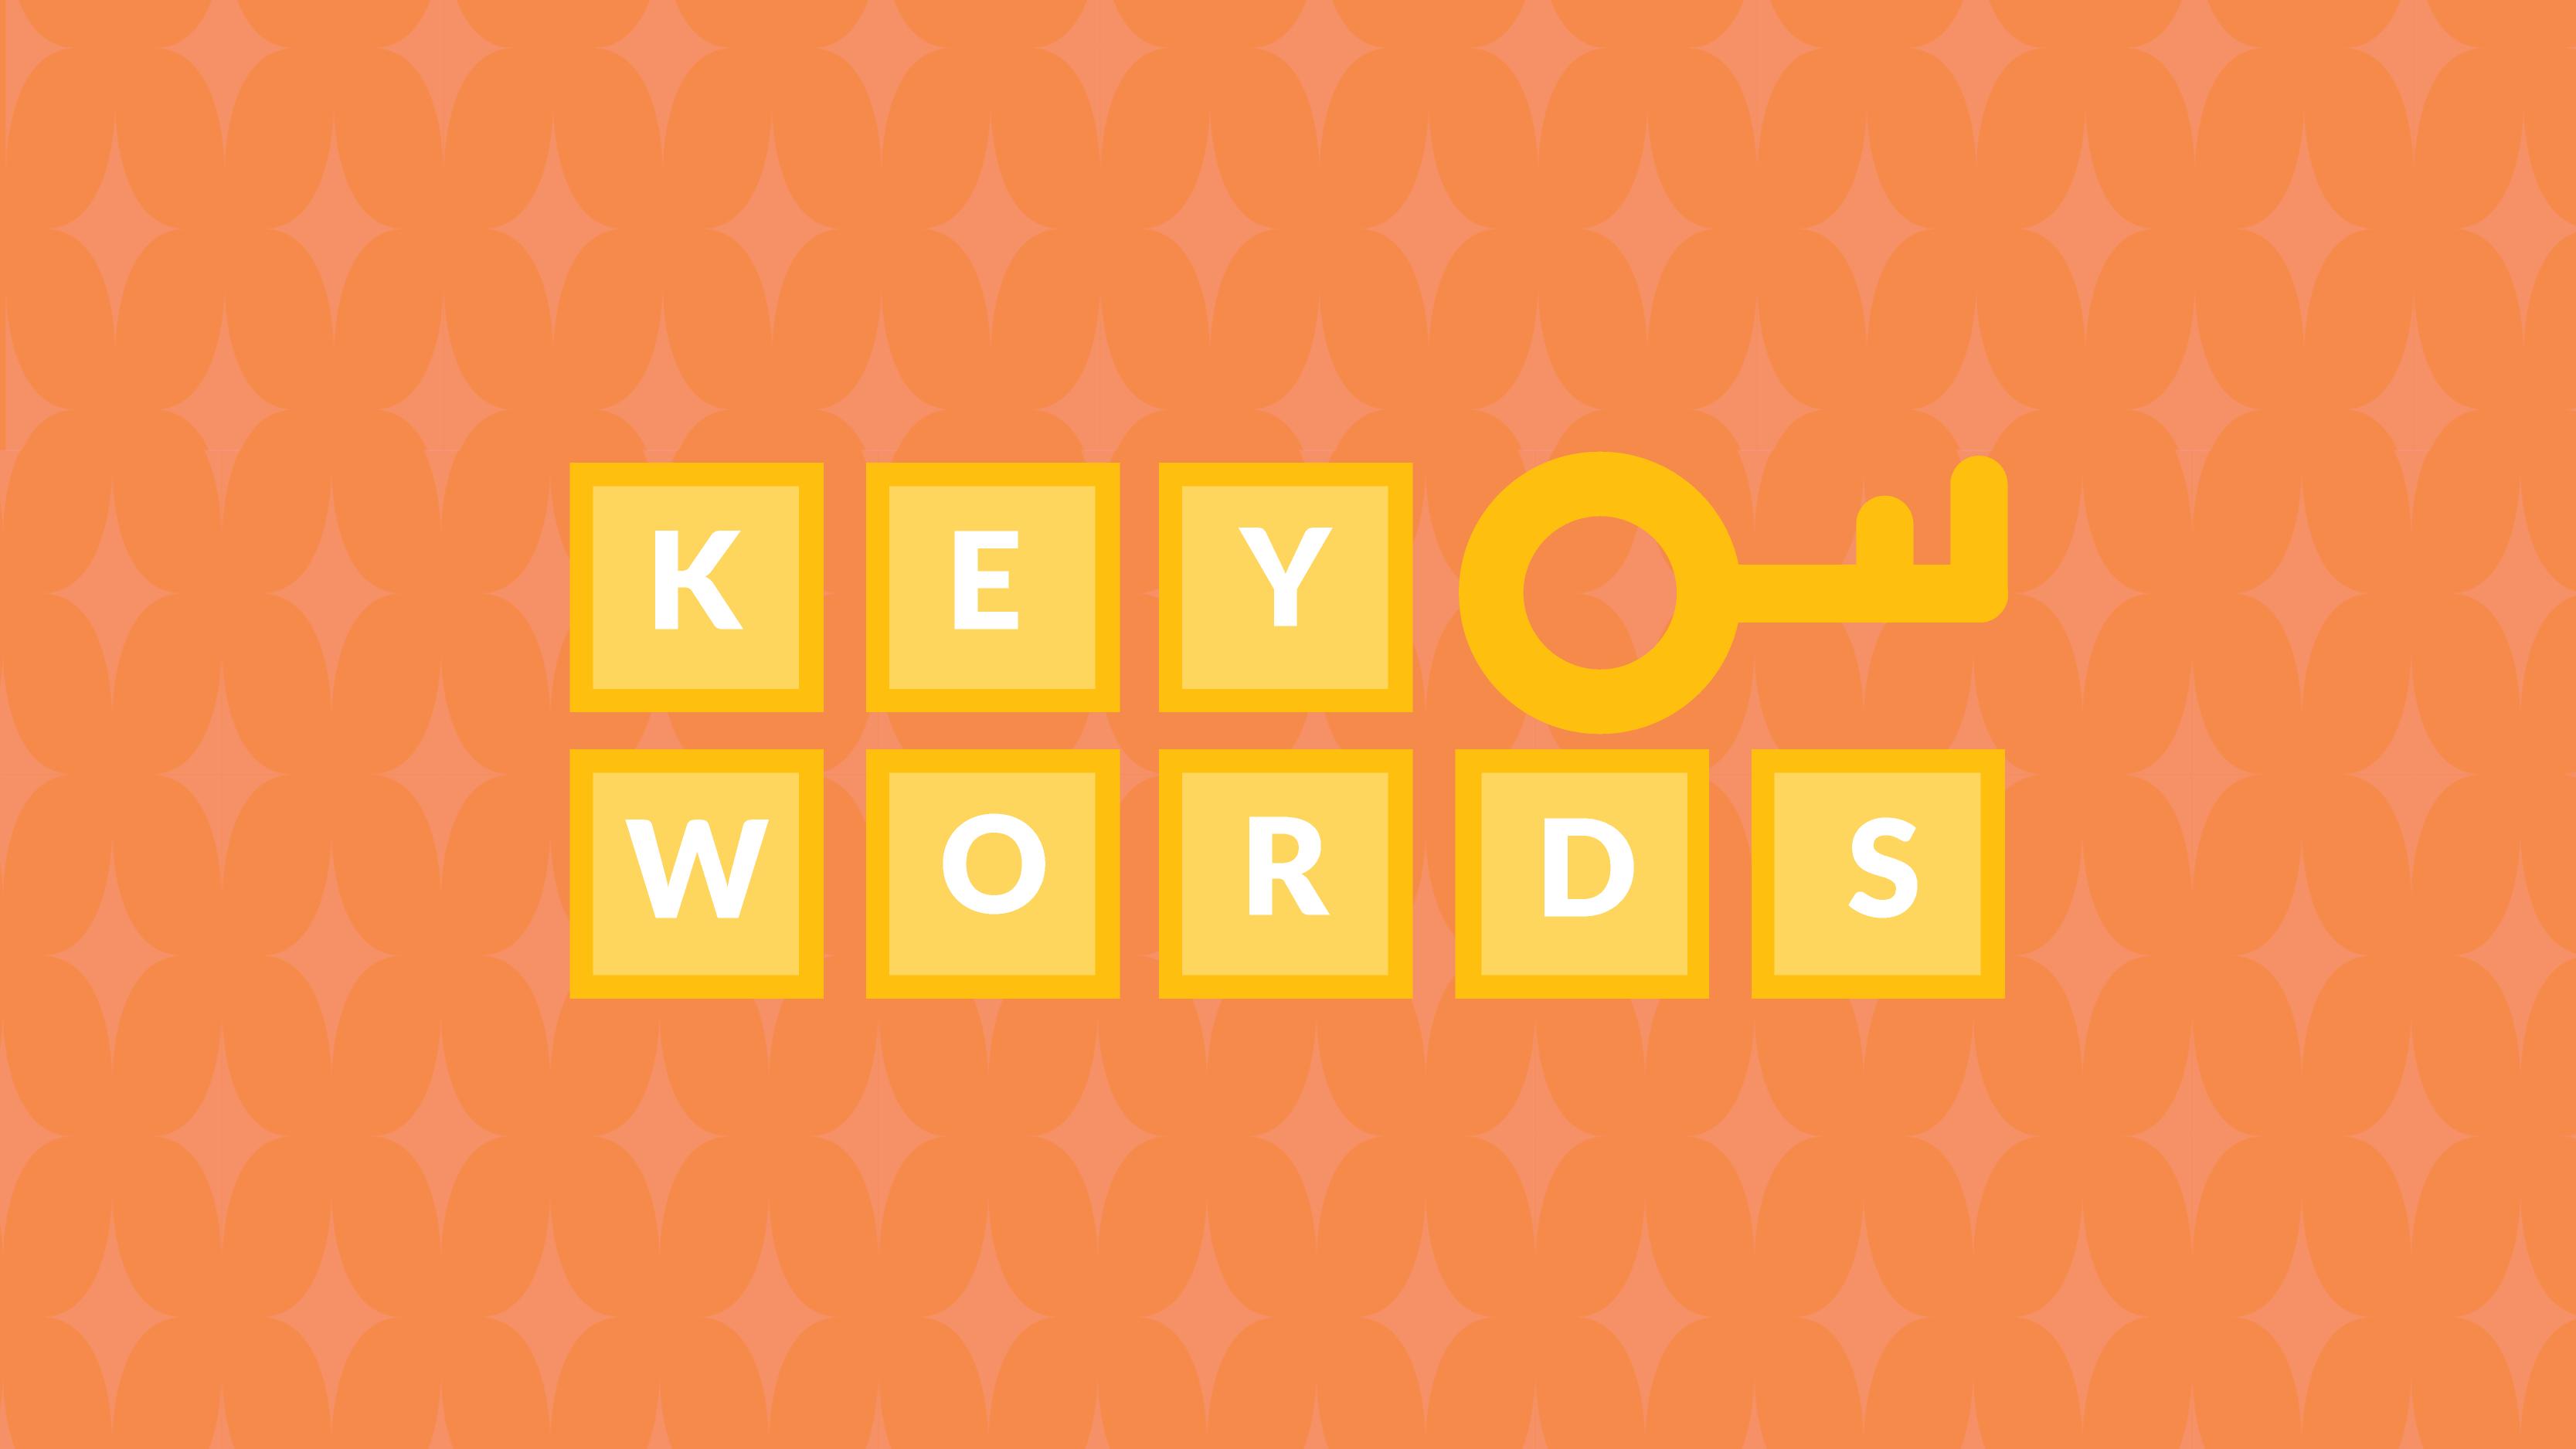 جستجوی کلمه کلیدی چیست؟ | پرگاس